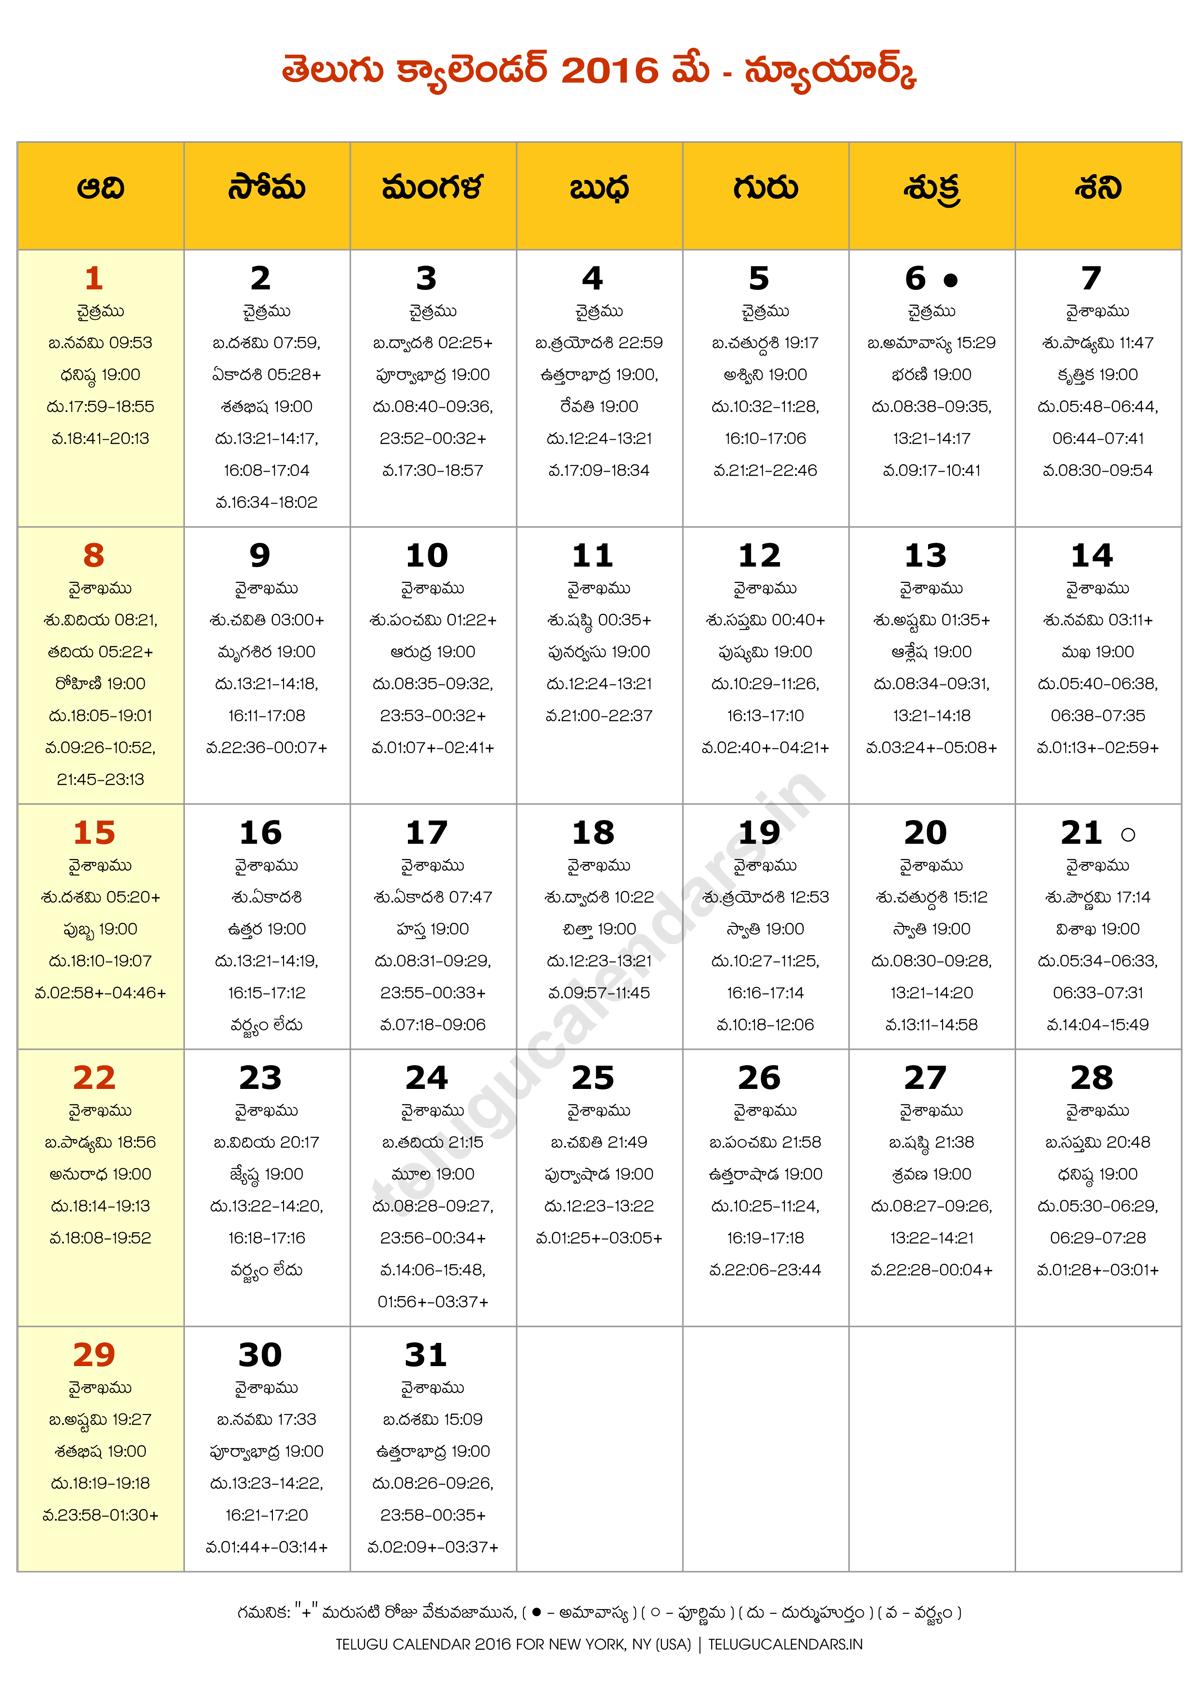 May Calendar New York : Telugu calendar new york usa may pdf